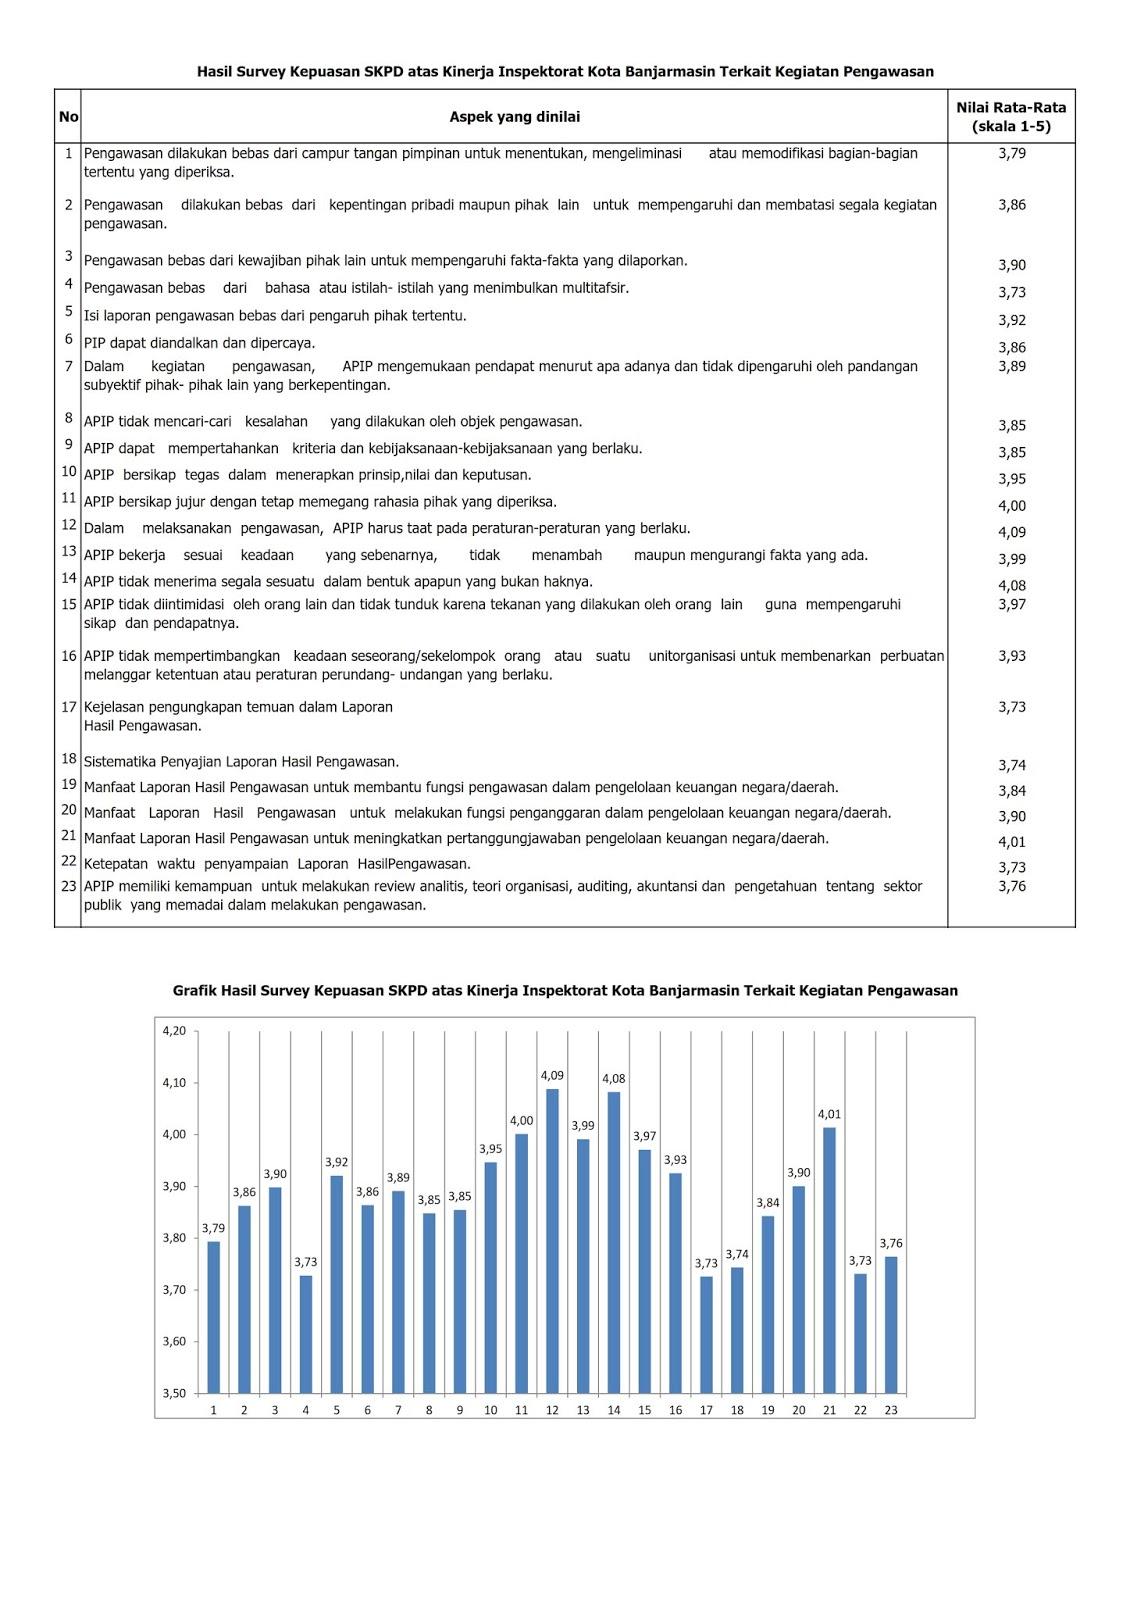 Data+RB+Survei+Kepuasan+SKPD.jpg (1130×1600)